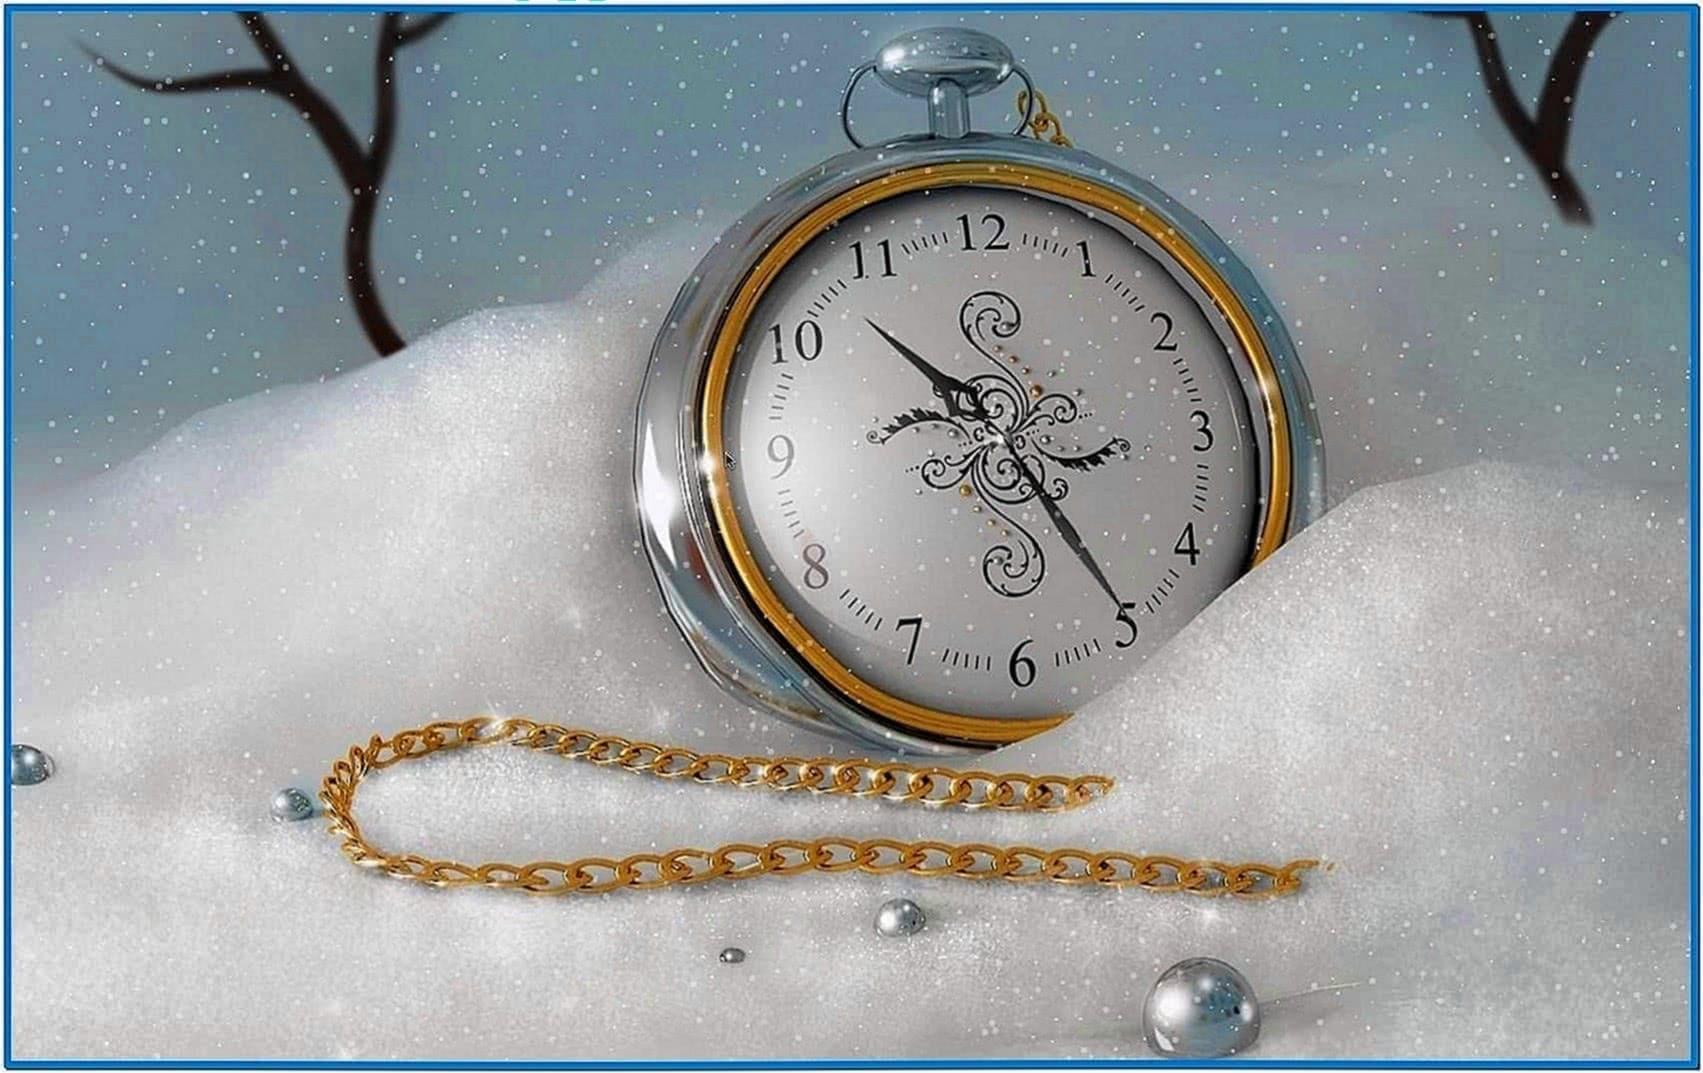 Snow Leopard Christmas Screensaver